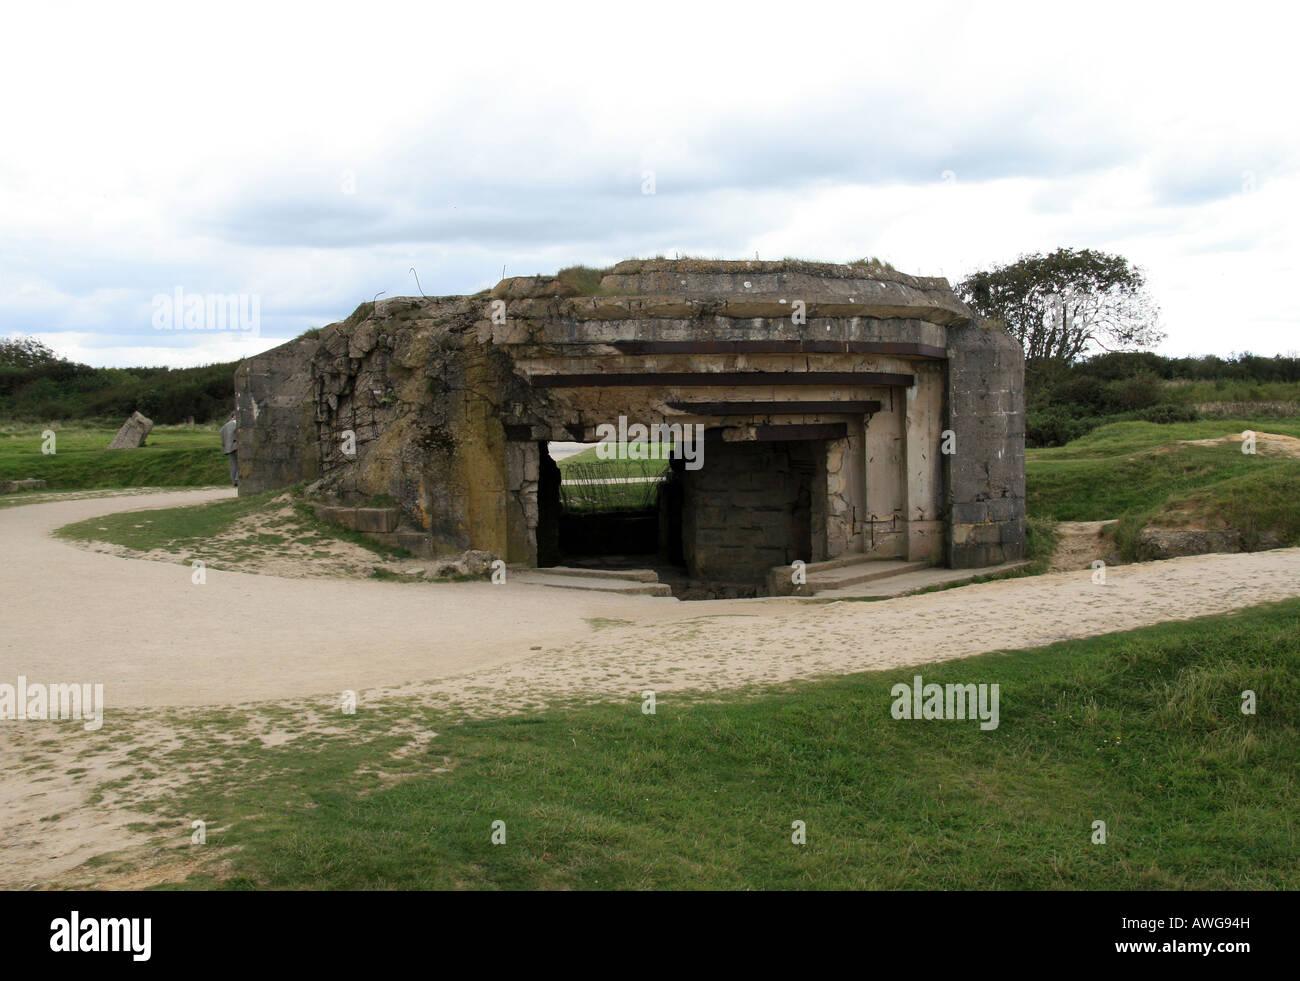 A German Artillary encasement on Pointe du Hoc, Normandy. - Stock Image